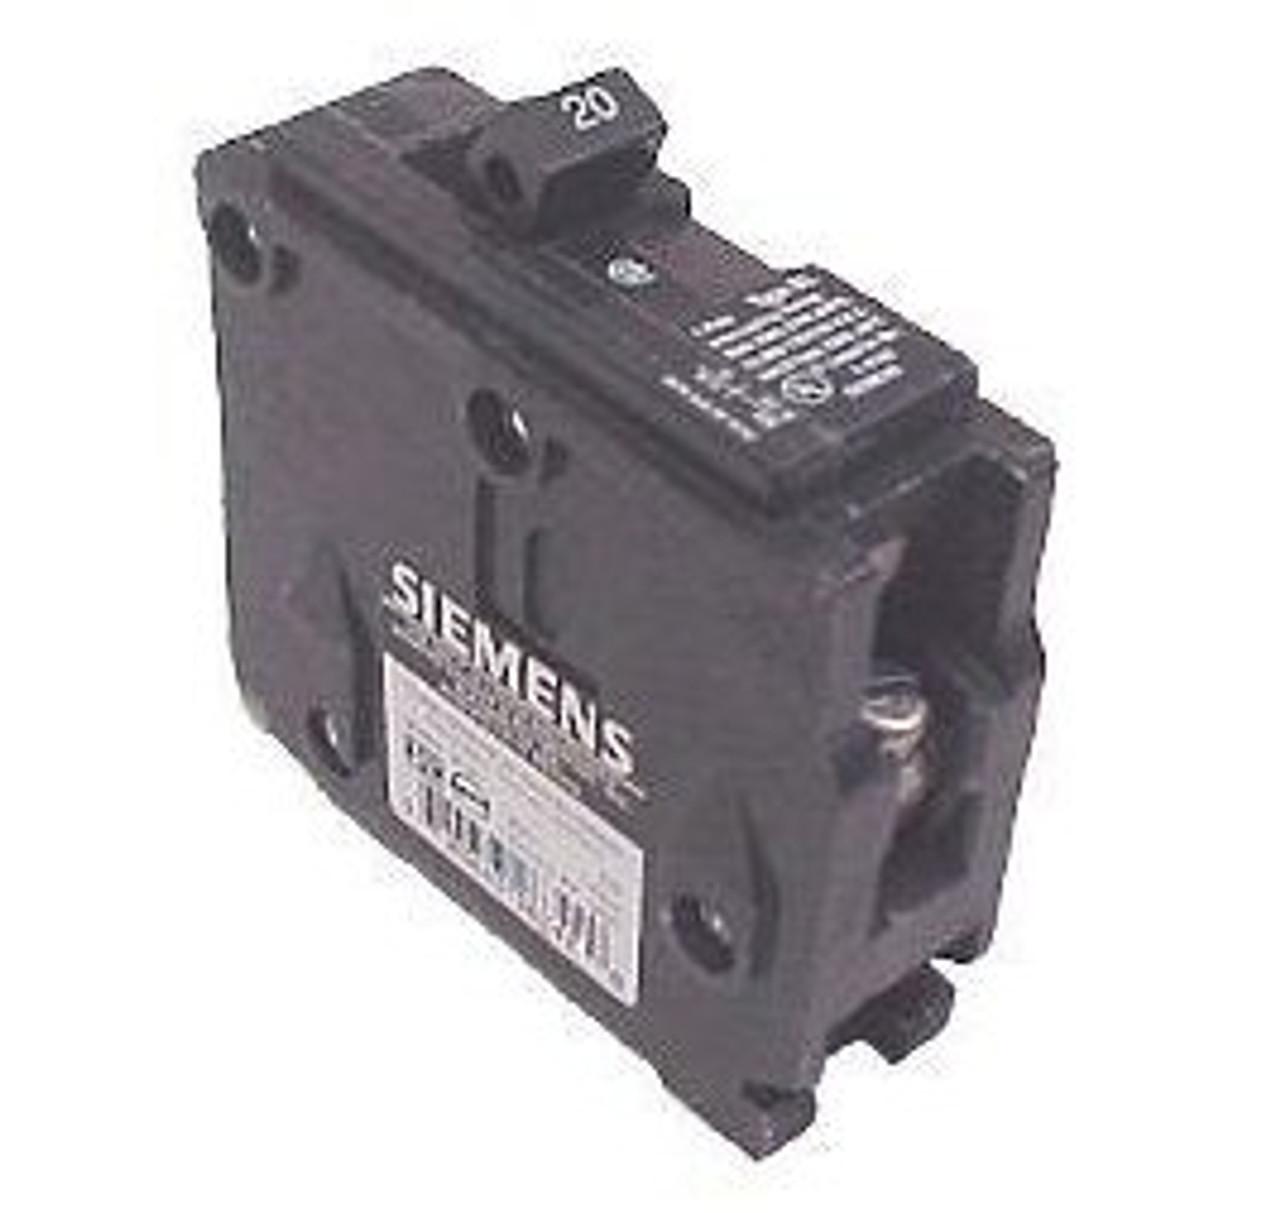 Siemens B115H, 1 Pole, 15 Amps, 120VAC, Type BL Circuit Breaker - Used